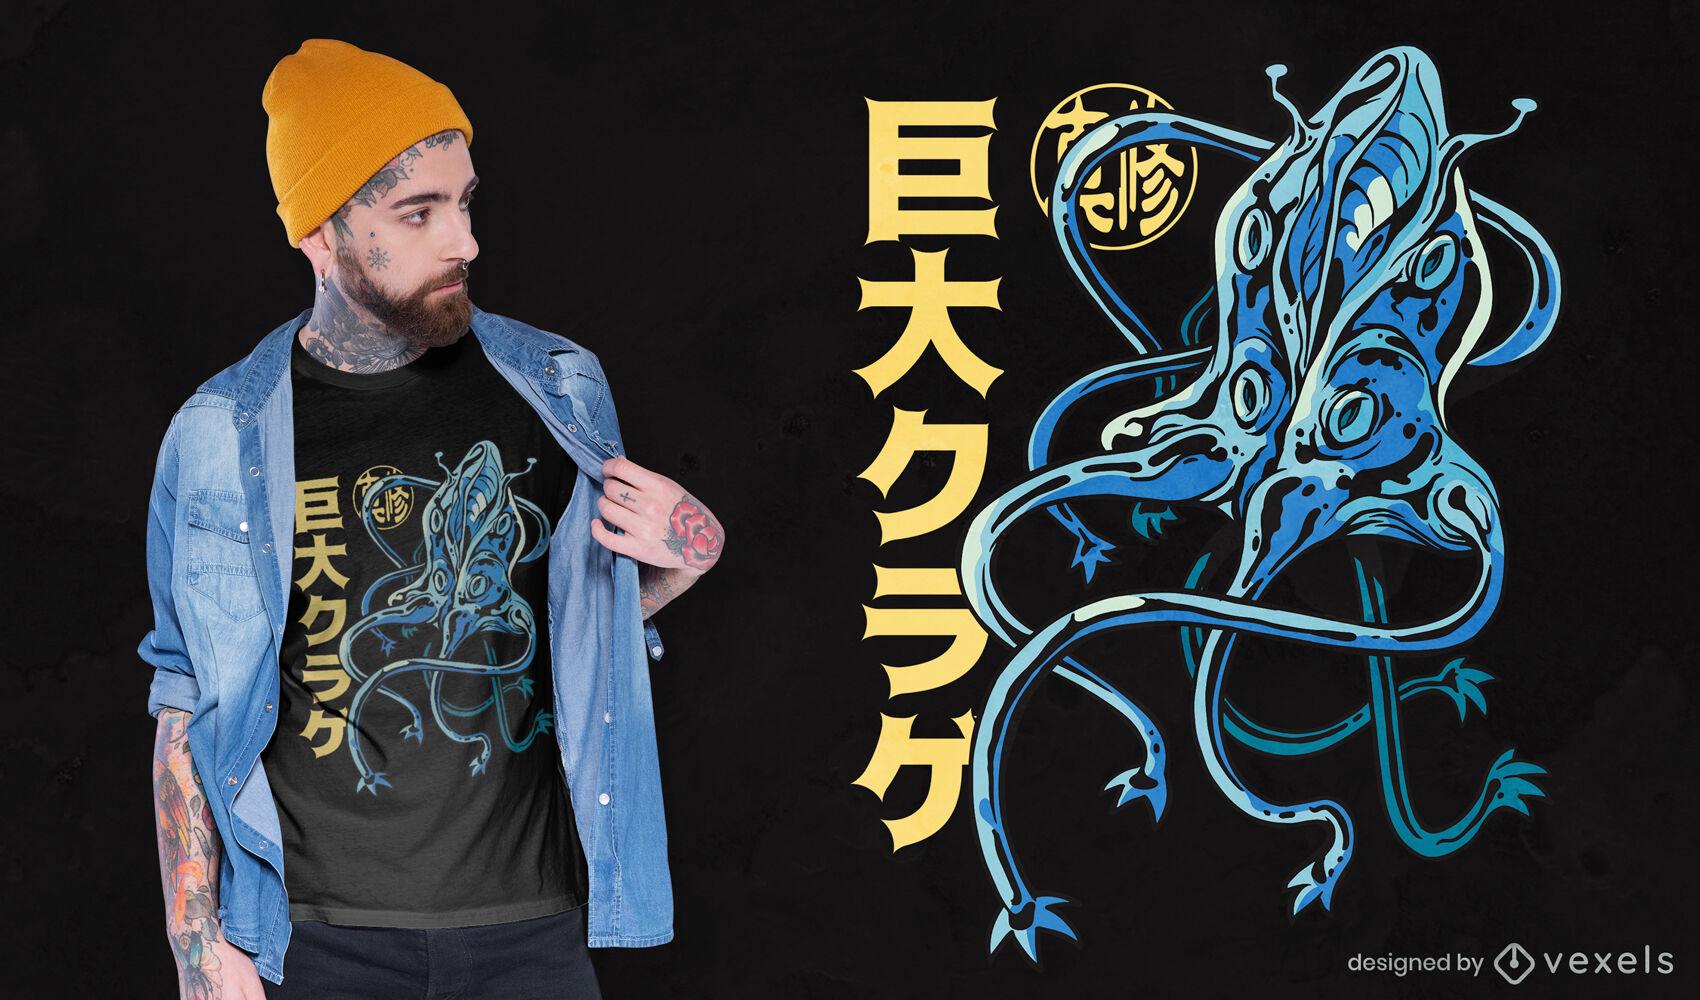 Dise?o de camiseta de anime de monstruo japon?s de medusas.